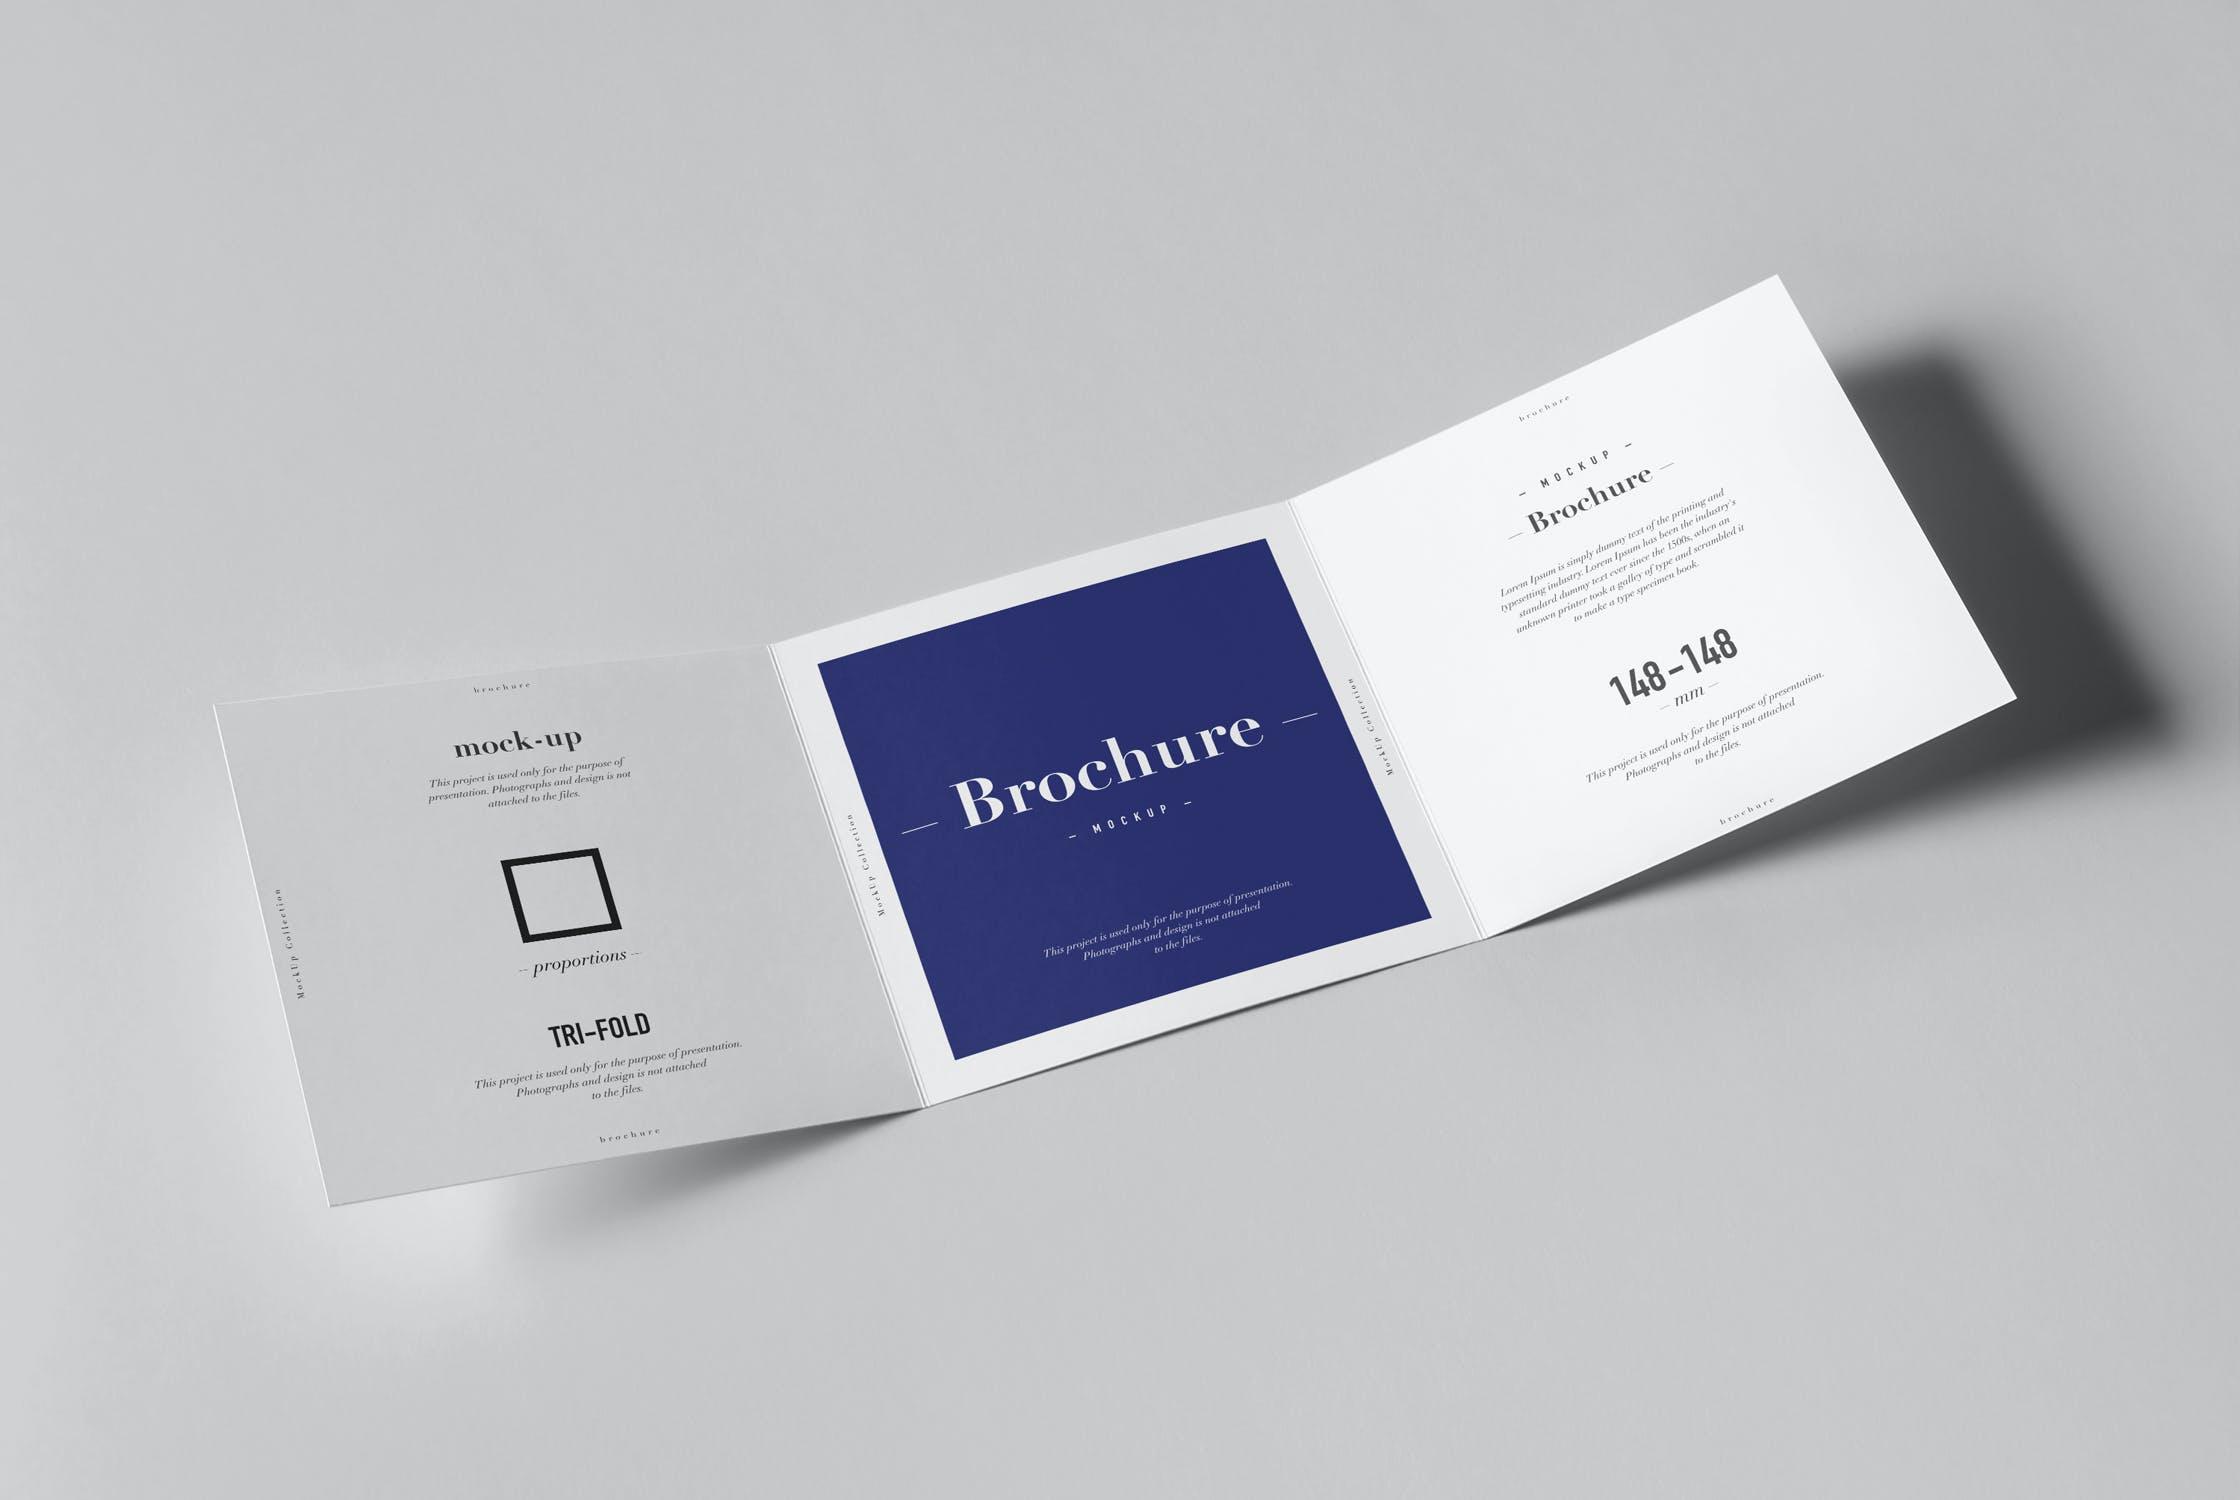 8款三折页小册子设计展示样机模板 Tri-Fold Square Brochure Mockup插图(4)